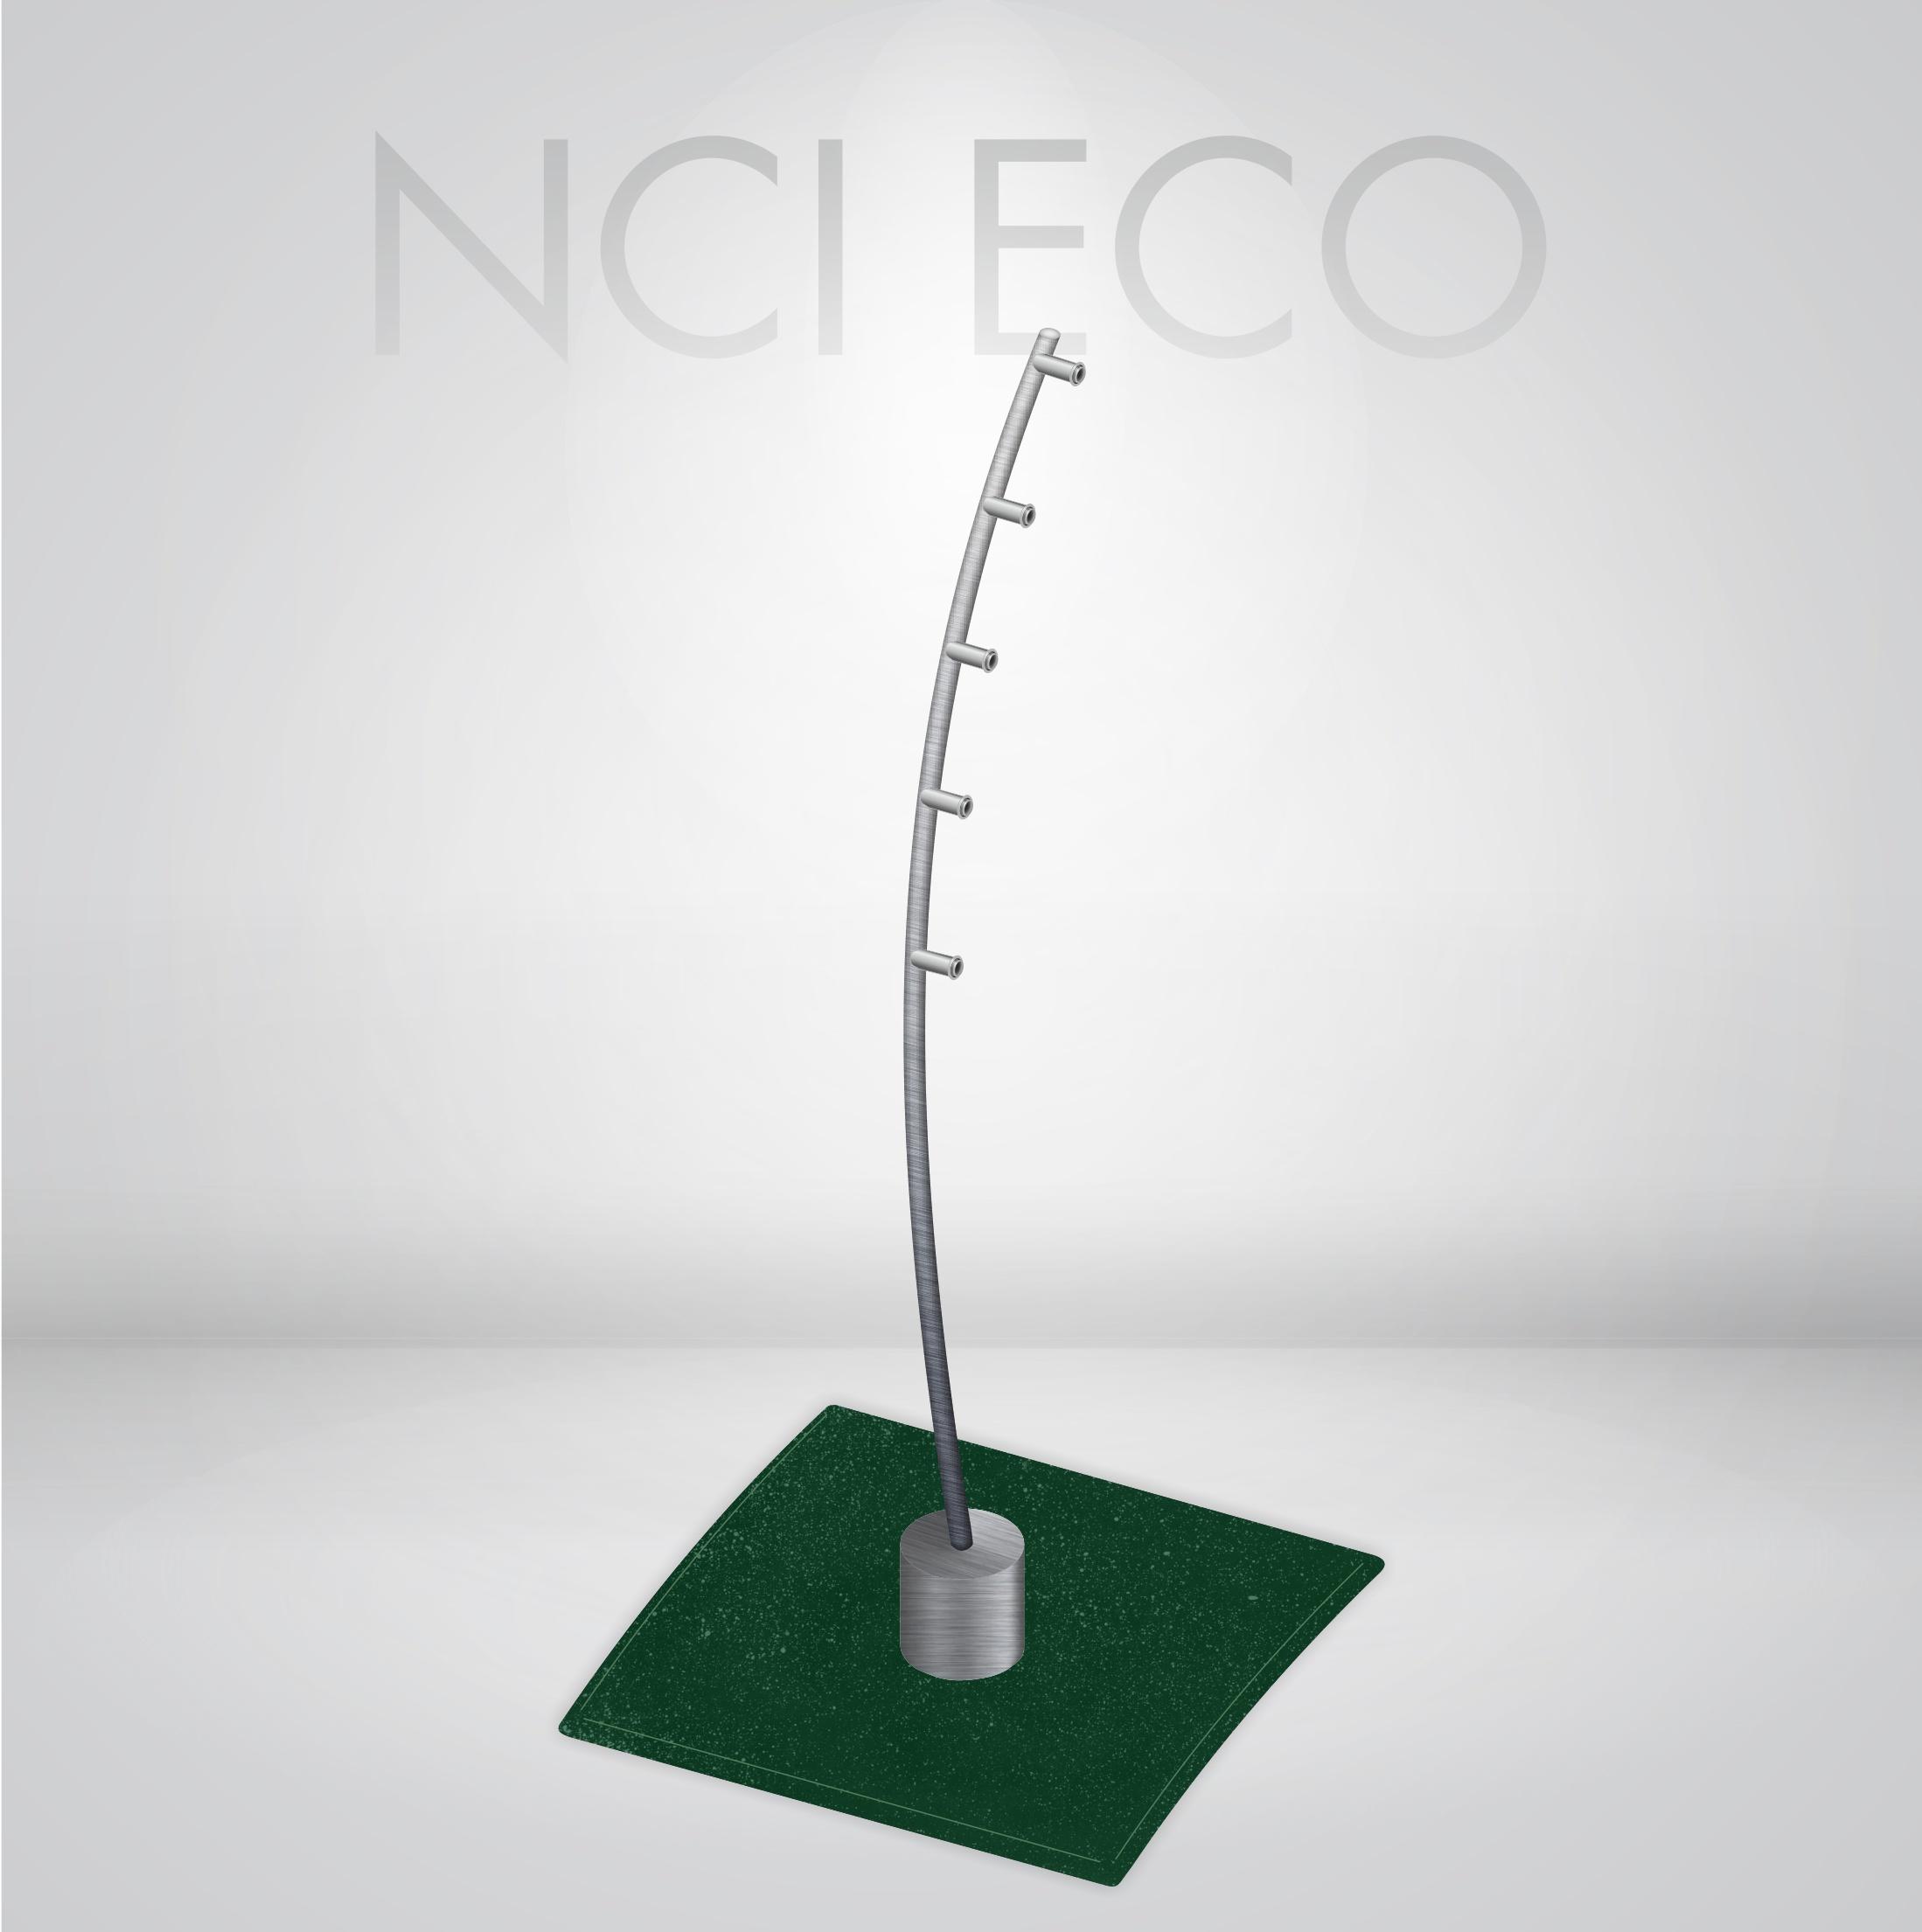 NCI Eco